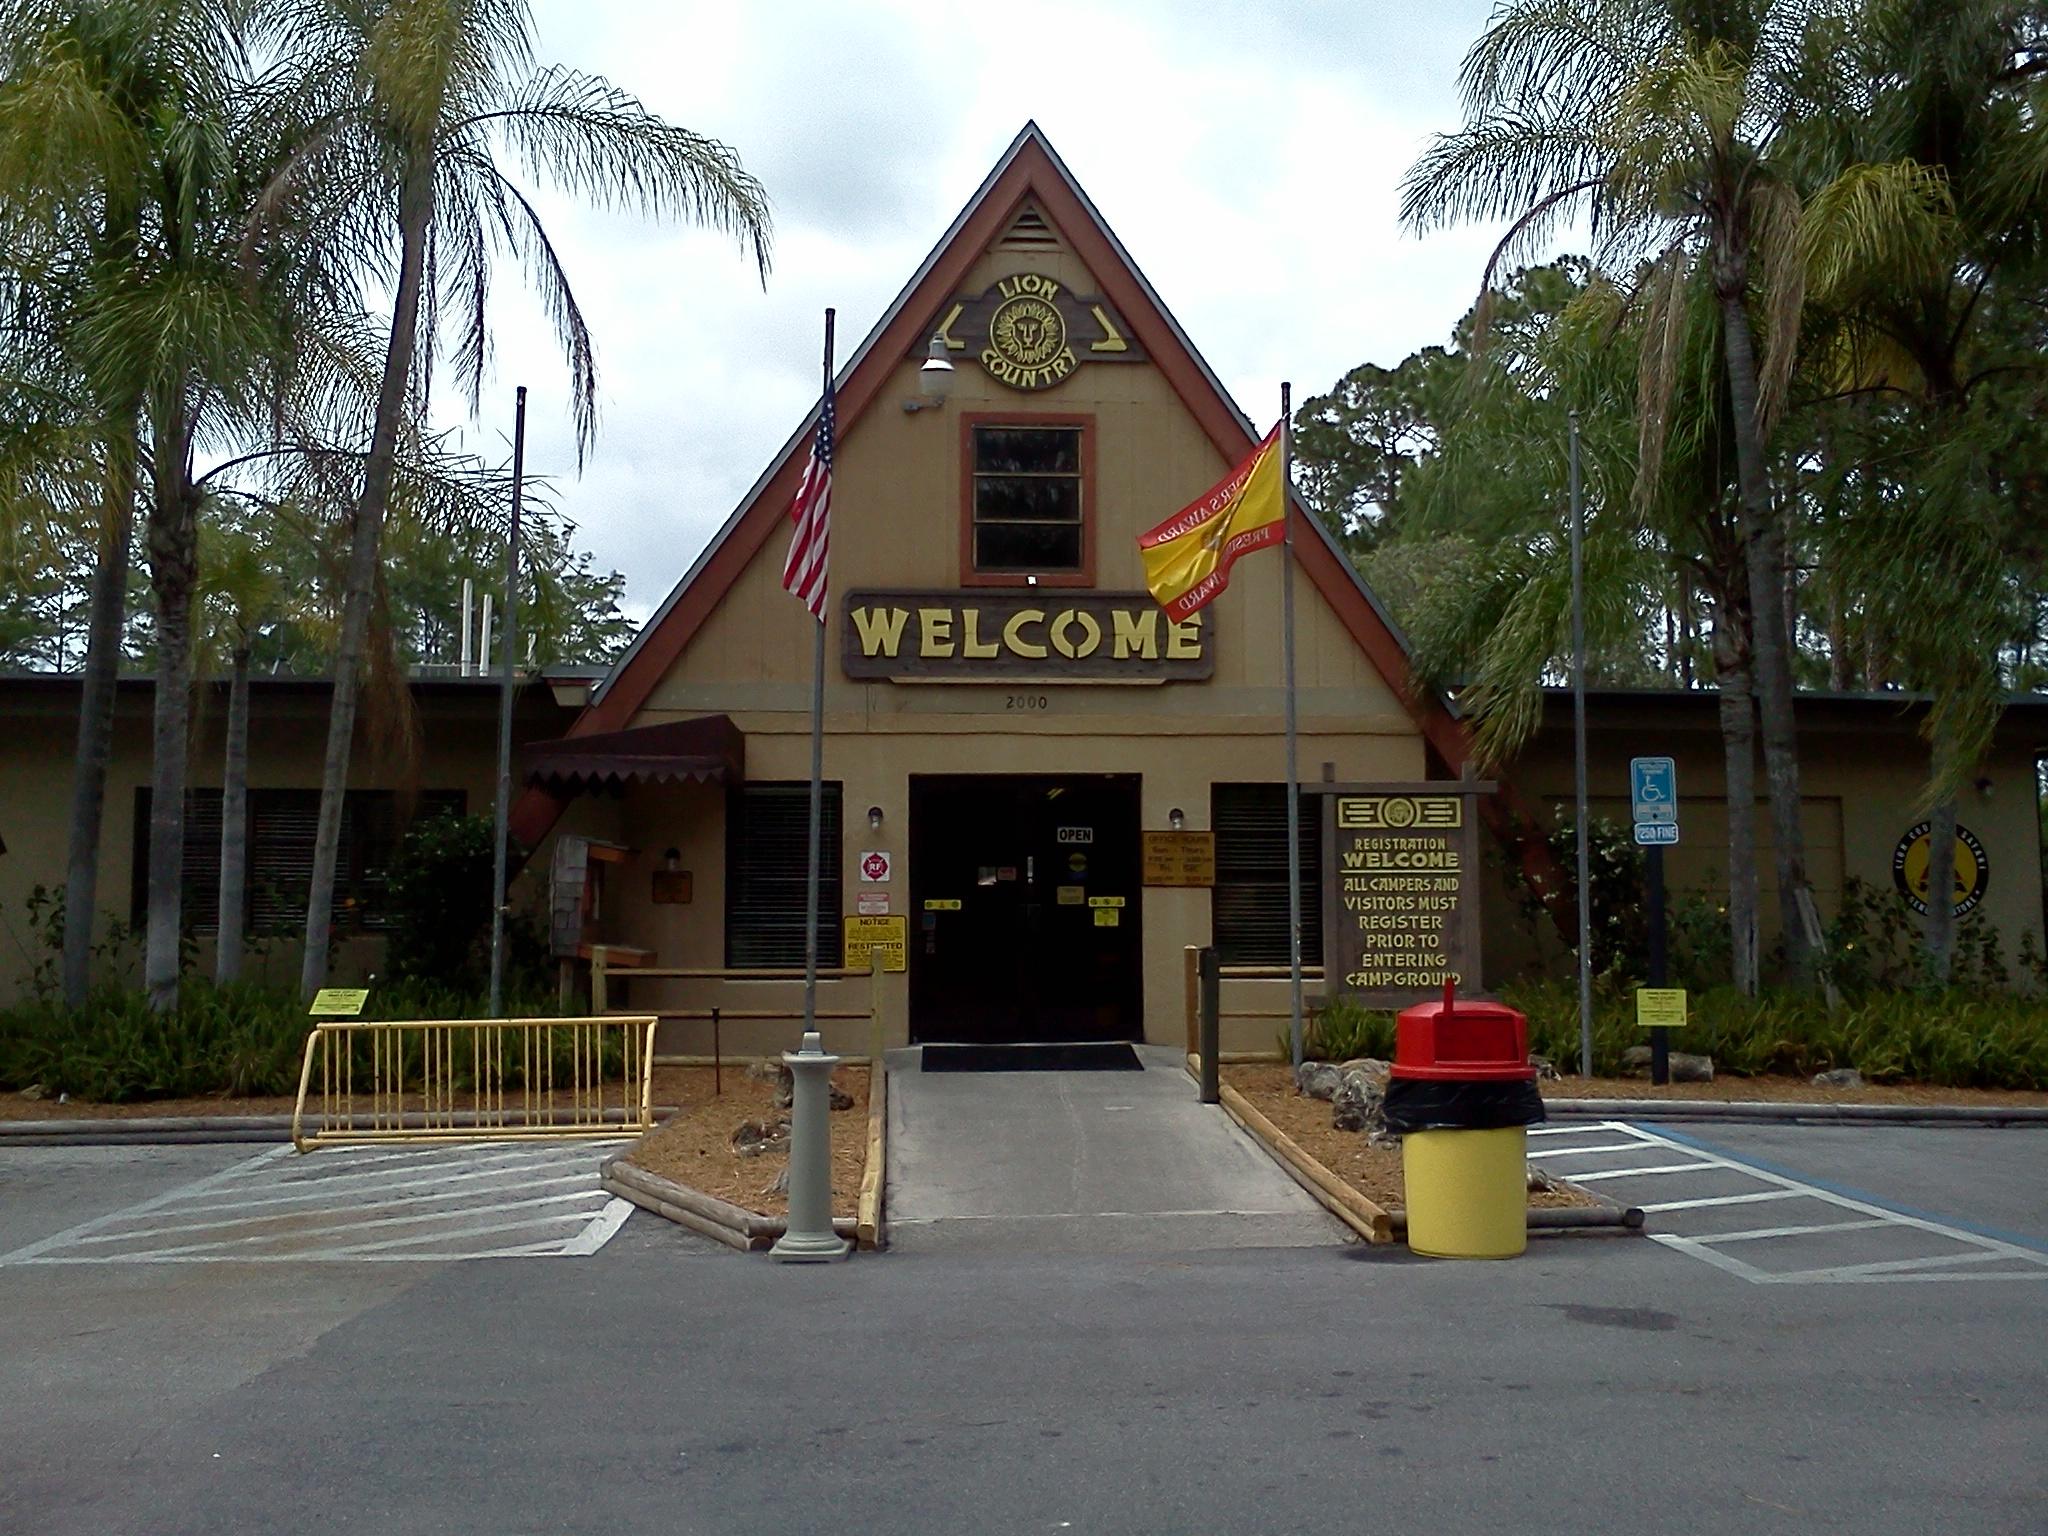 West Palm Beach / Lion Country Safari KOA image 9